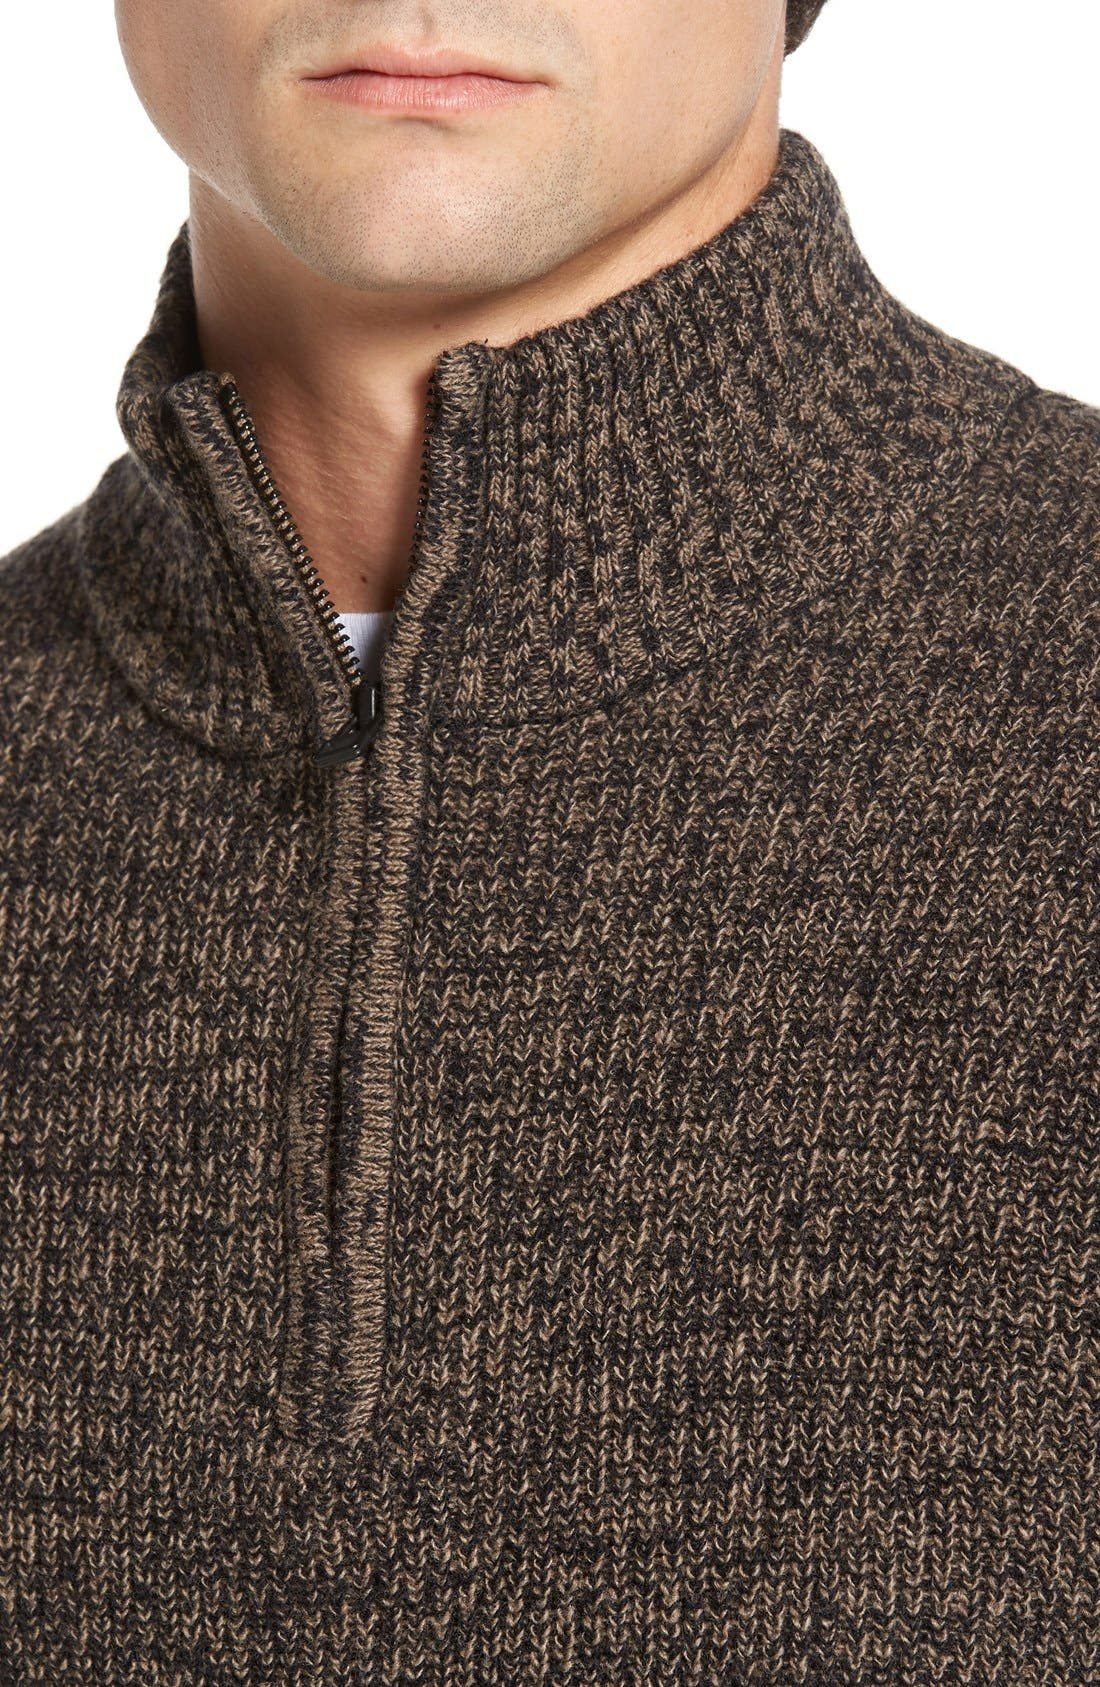 'Woodglen' Herringbone Knit Lambswool Quarter Zip Sweater,                             Alternate thumbnail 4, color,                             Walnut